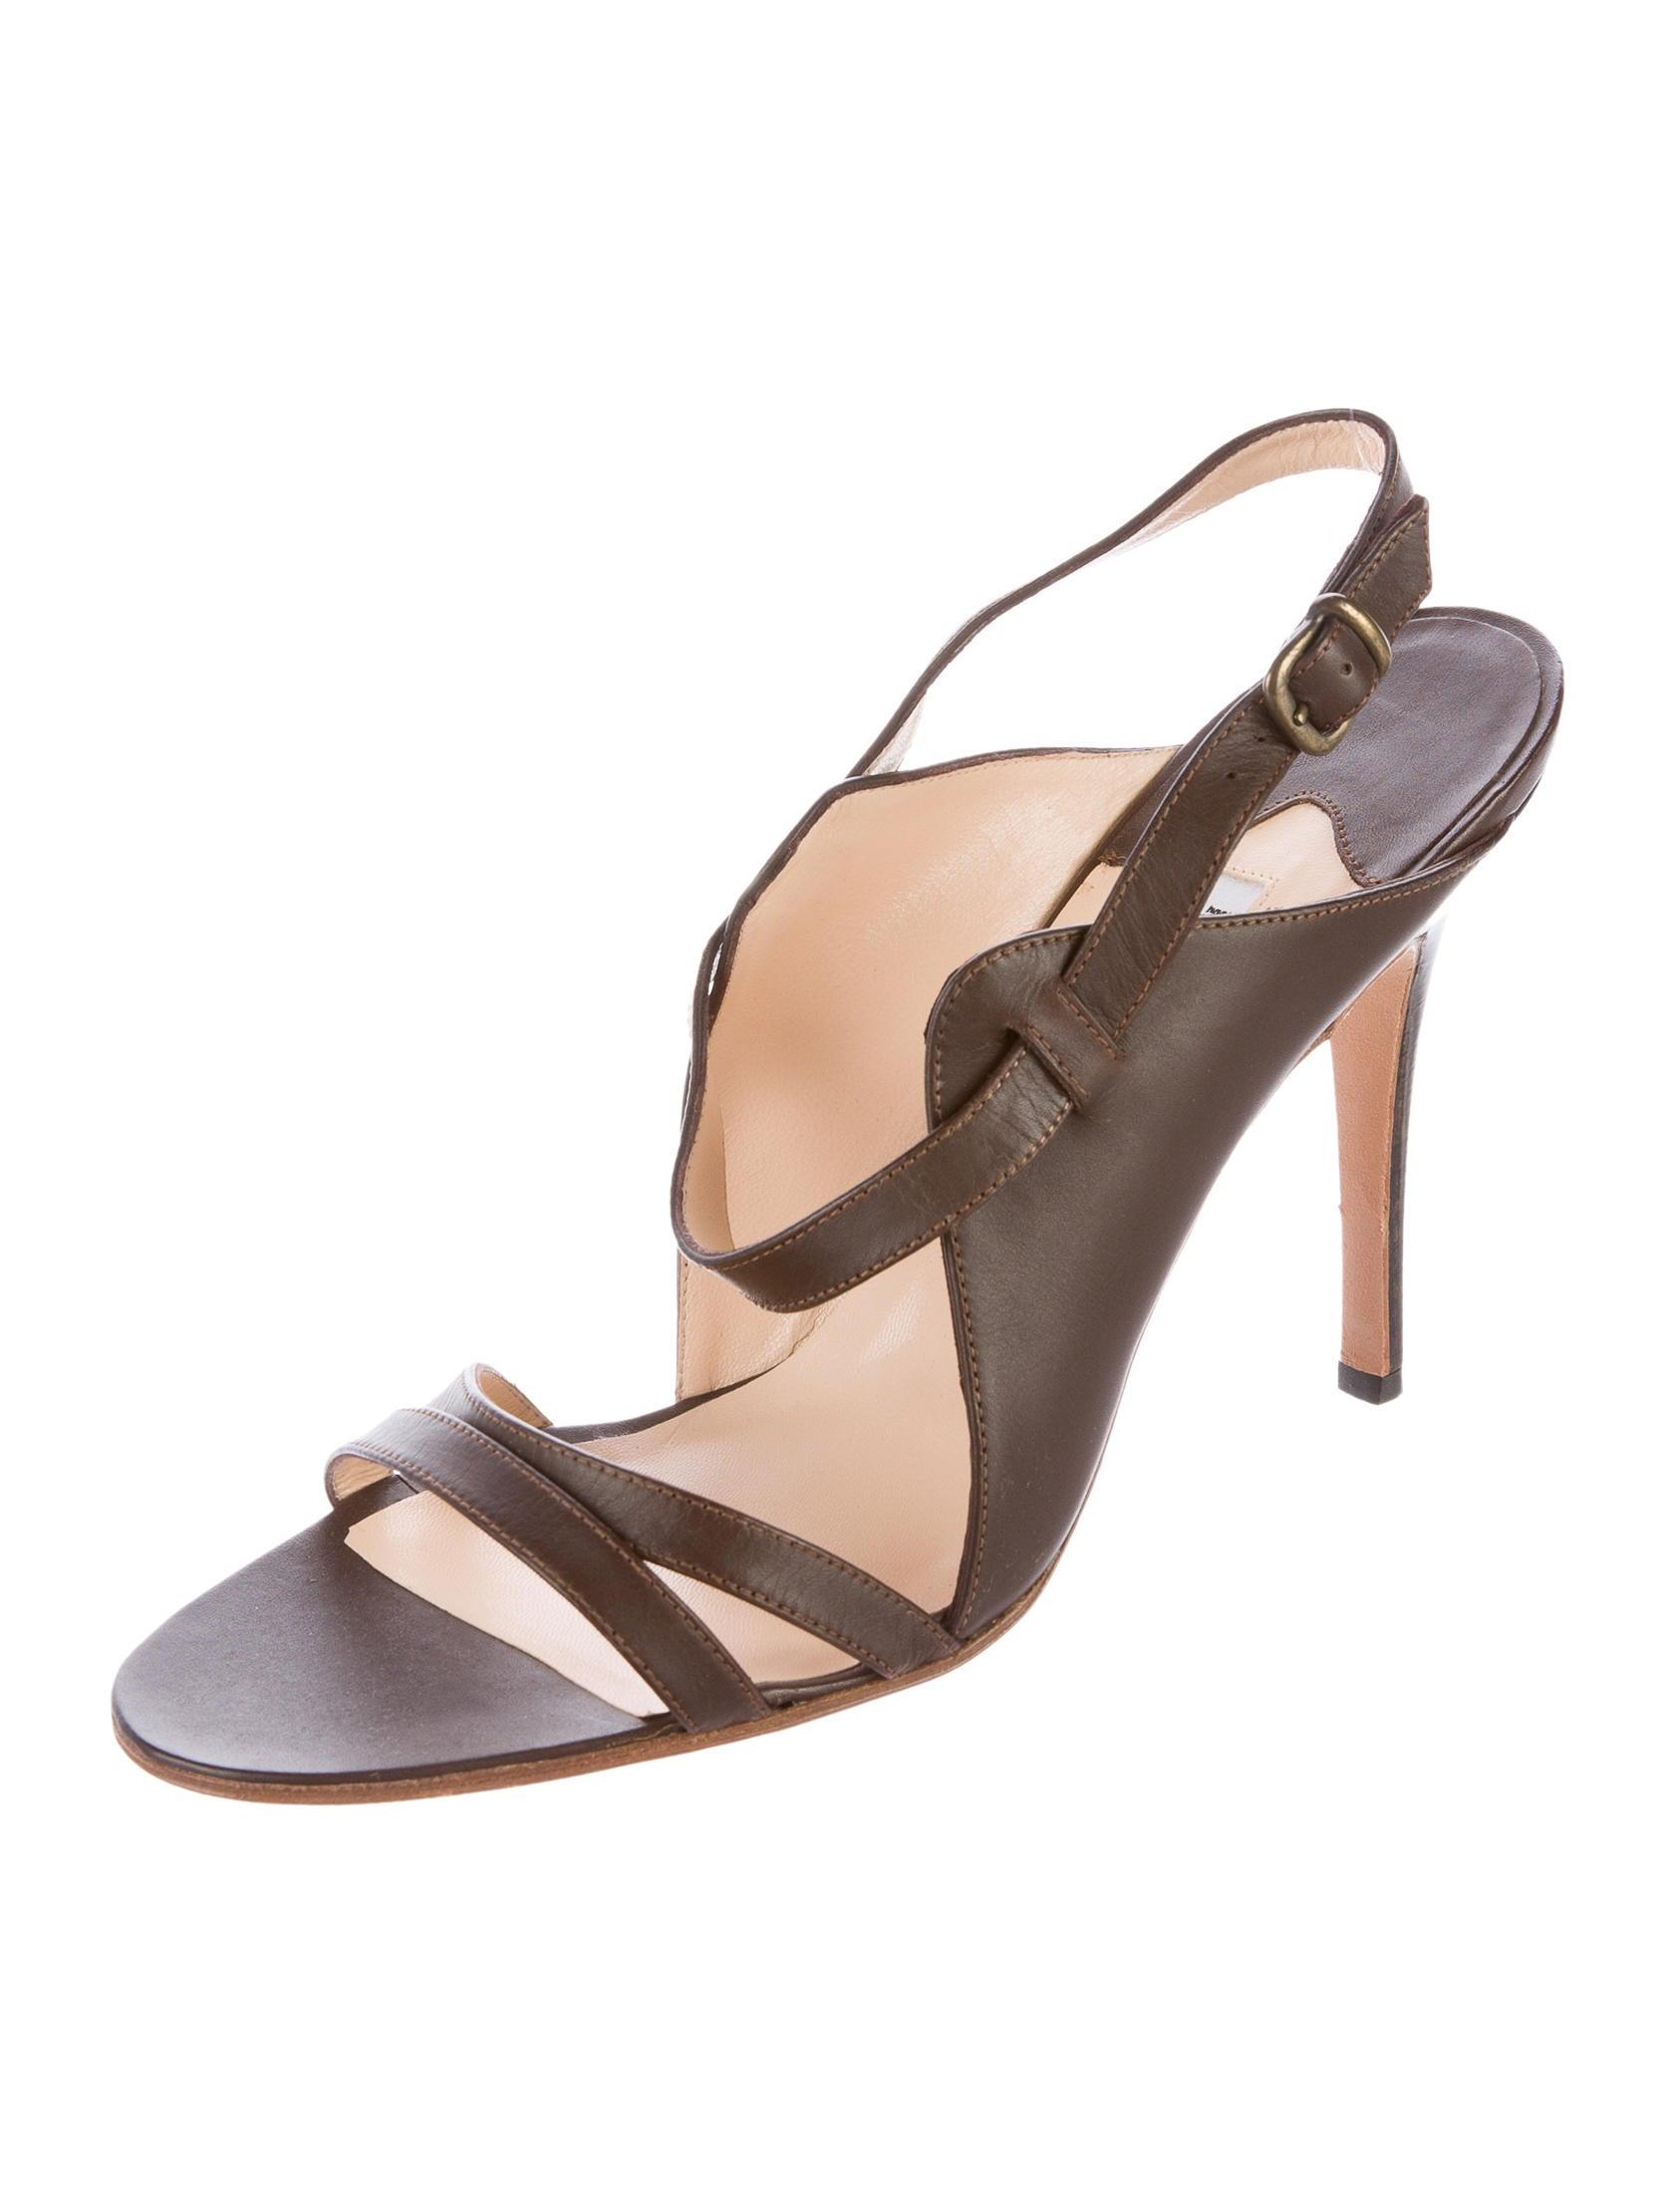 Manolo blahnik leather multistrap sandals shoes for Shoes by manolo blahnik